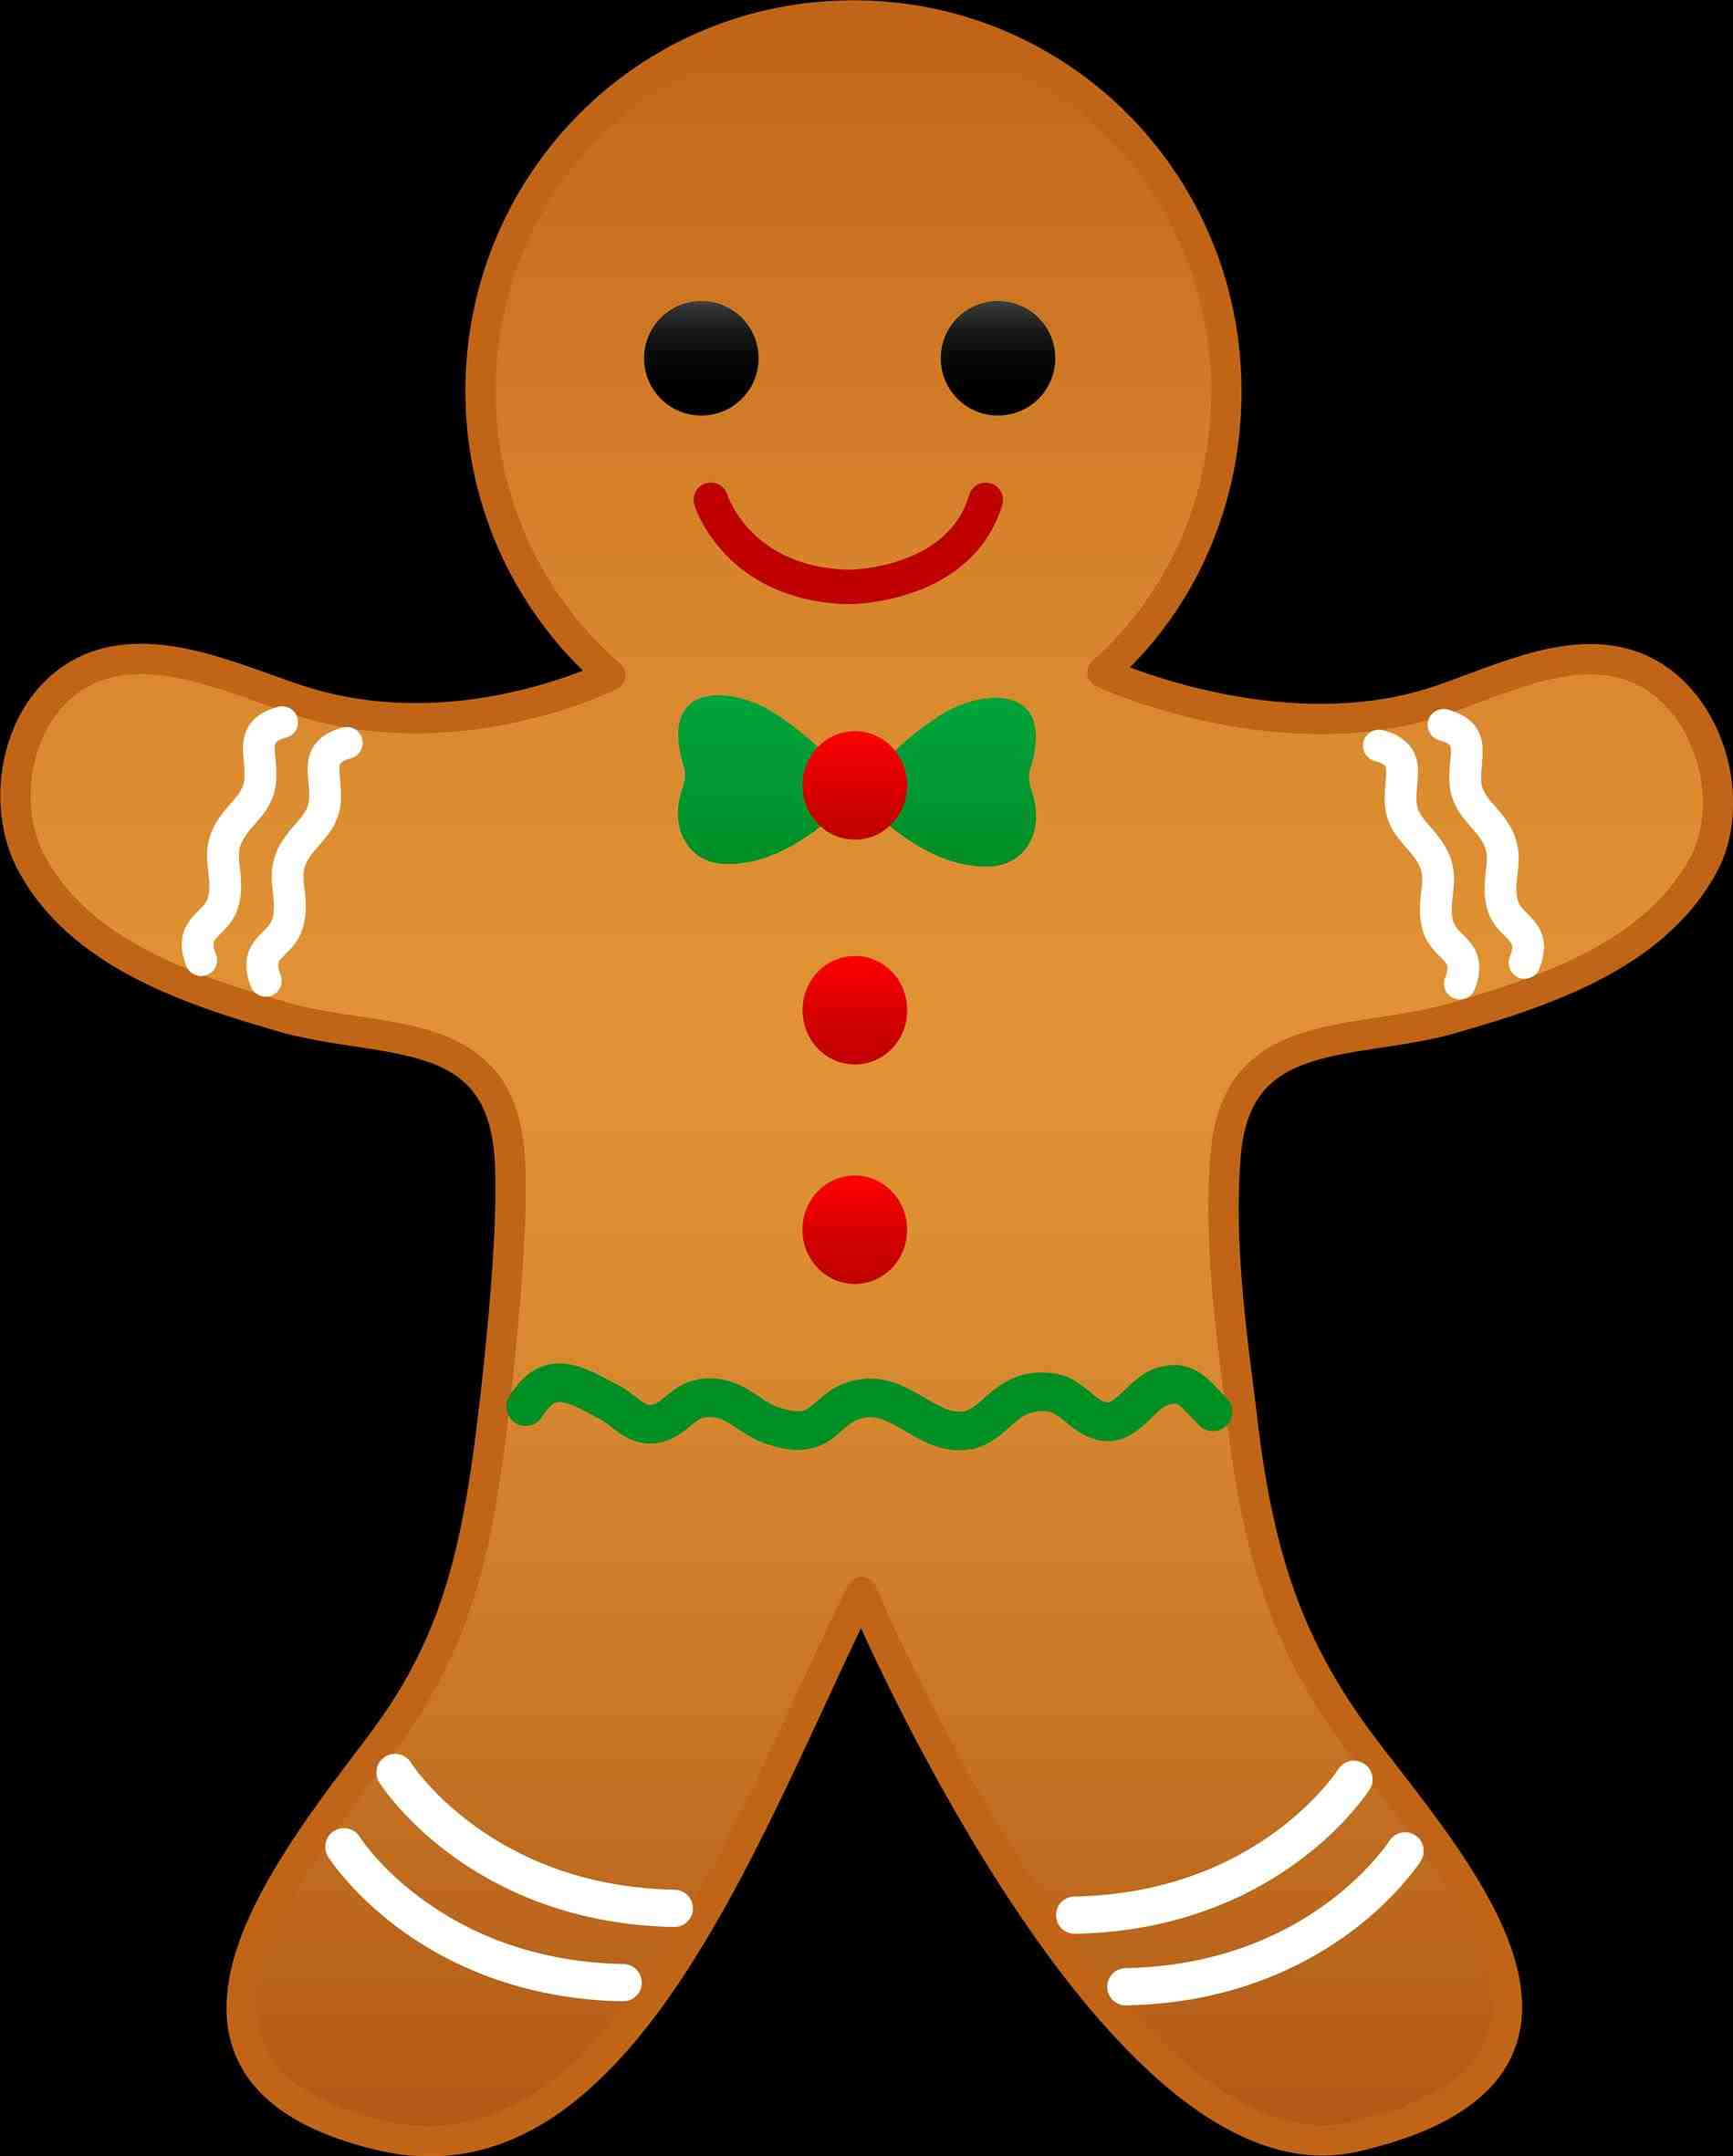 1899x2363 Man Clipart Gcom Kid Ingcom Kid Christmas Gingerbread Man Clipart